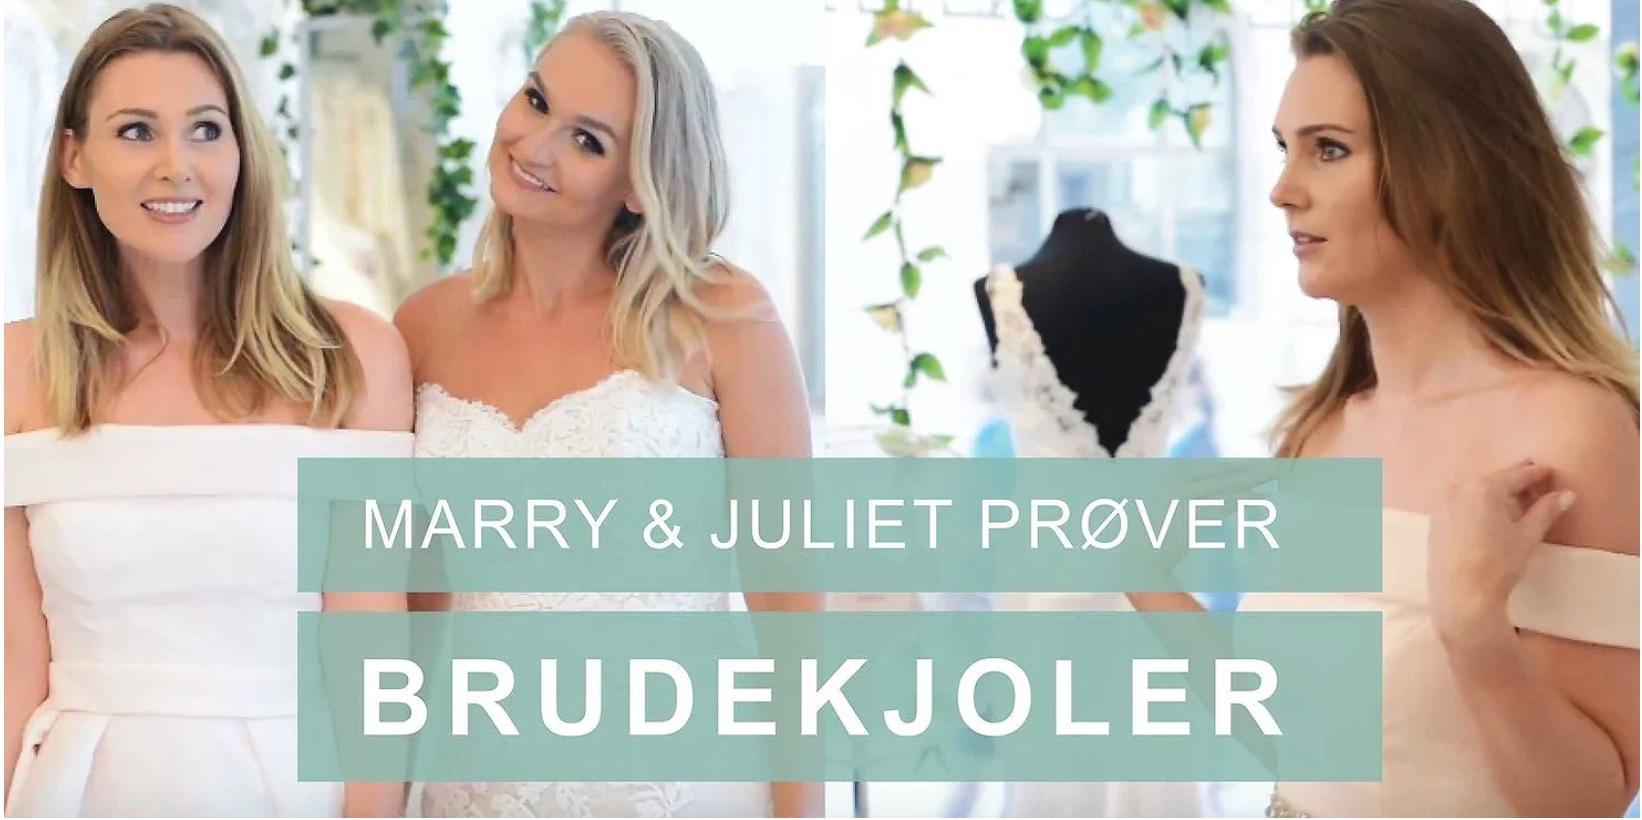 Brudekjole Brudesalong prøvetime marry & juliet